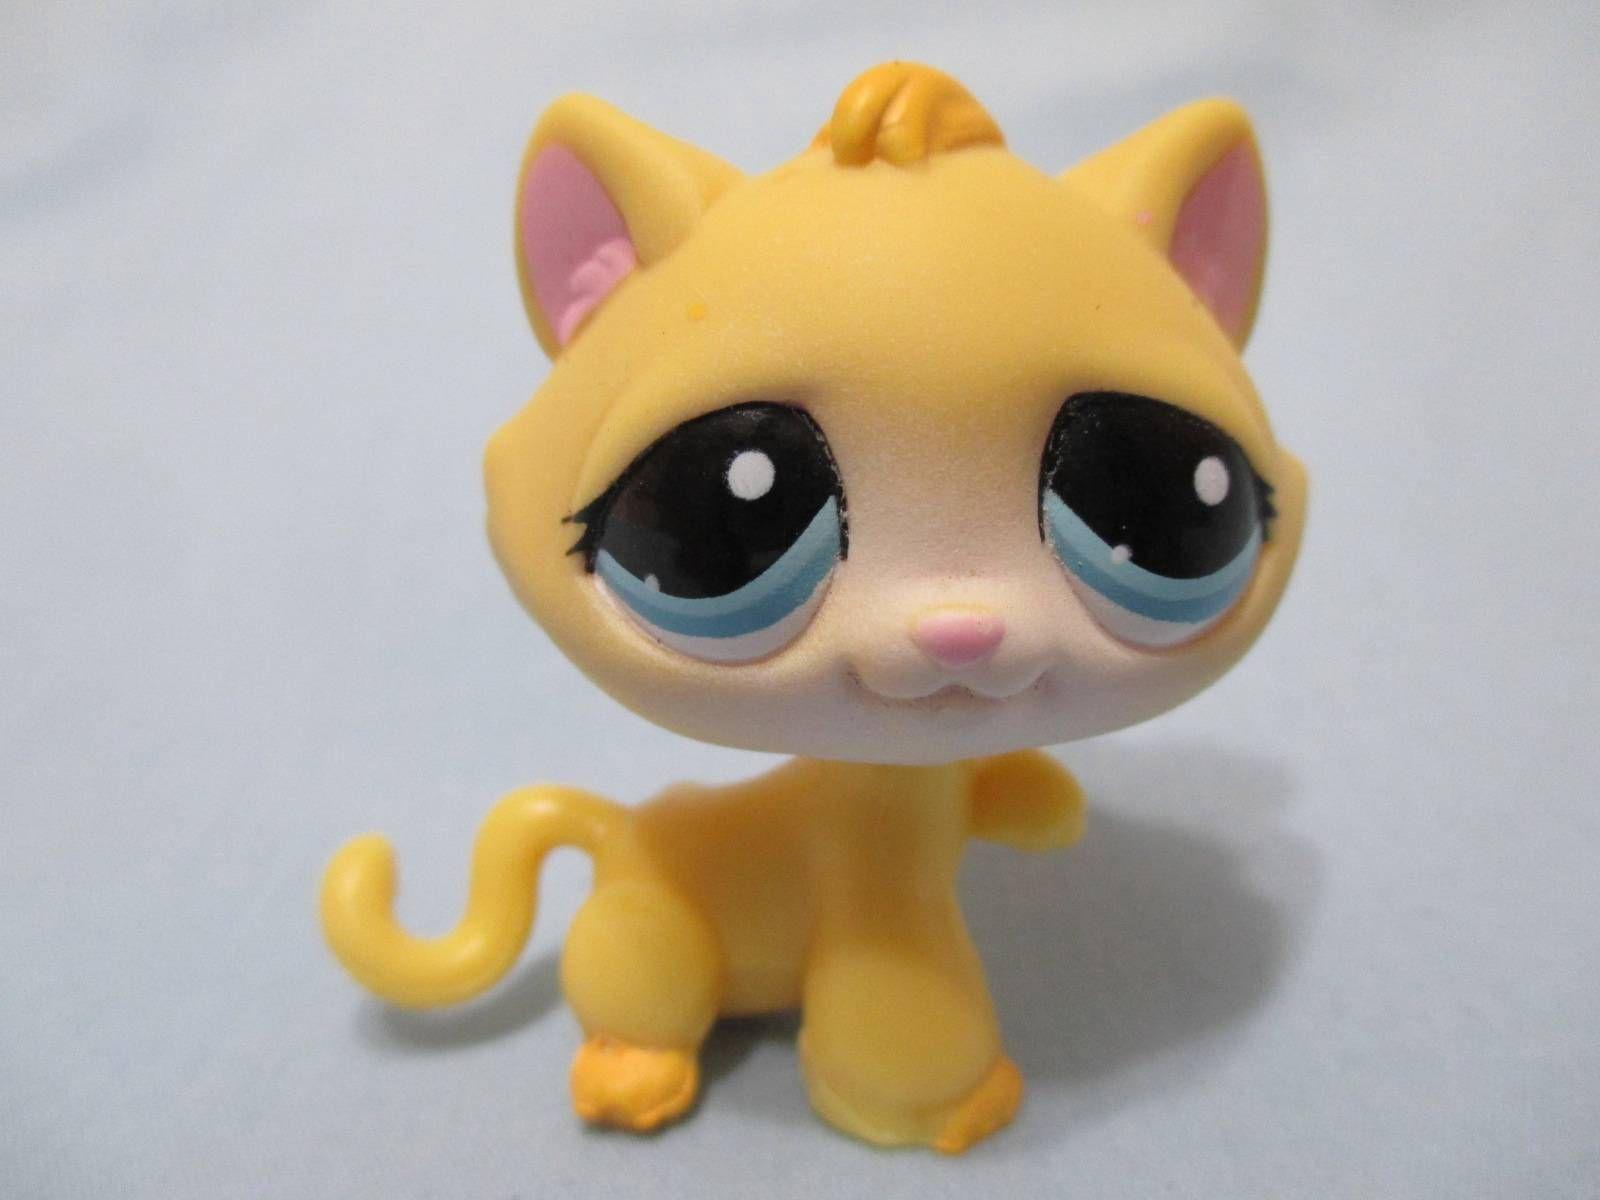 Littlest Pet Shop Cat Kitty Tabby Yellow W Blue Eyes Paw Up 1035